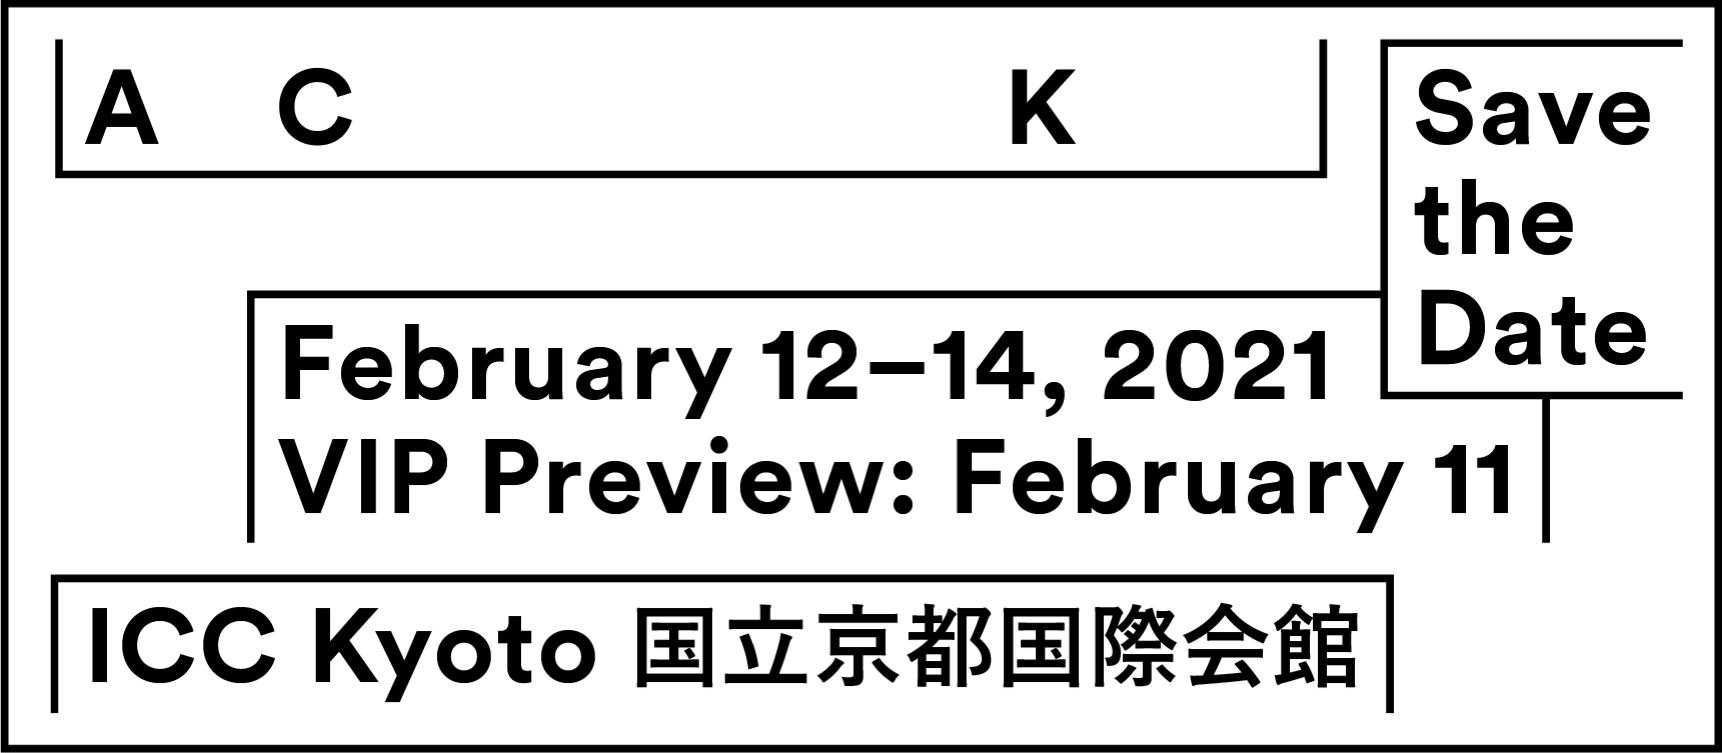 ACK(アートコラボレーション京都)